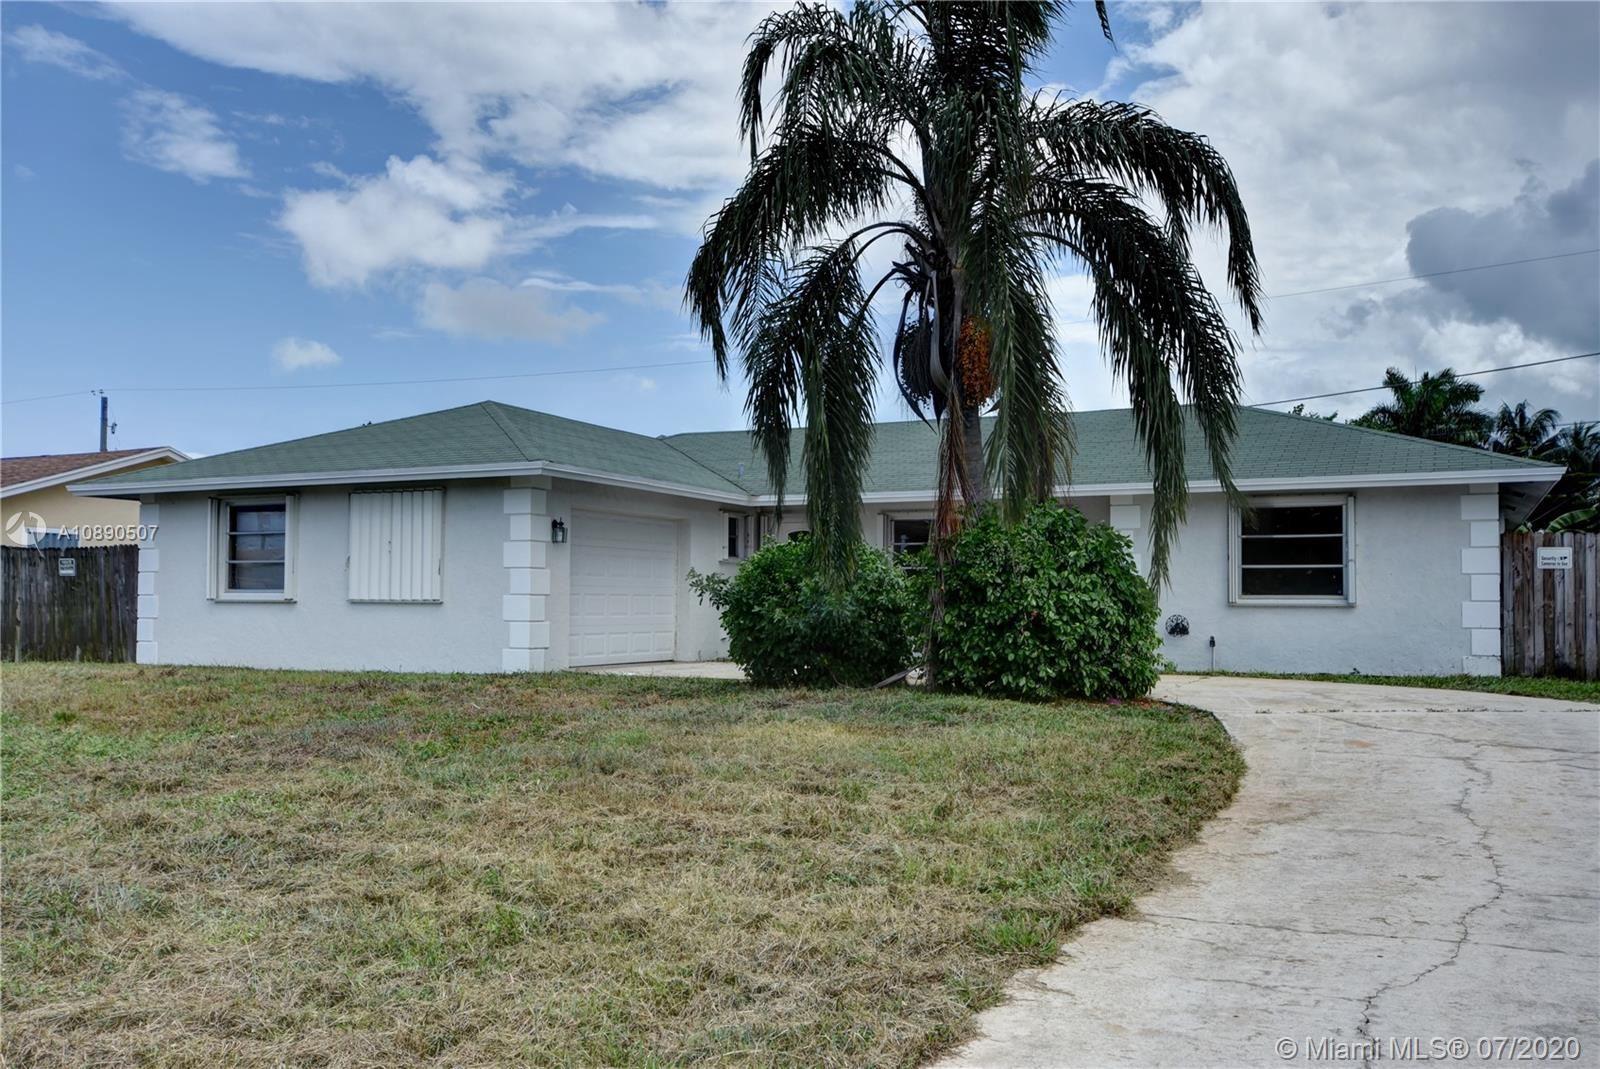 3560 Dorrit Ave, Boynton Beach, FL 33436 - #: A10890507